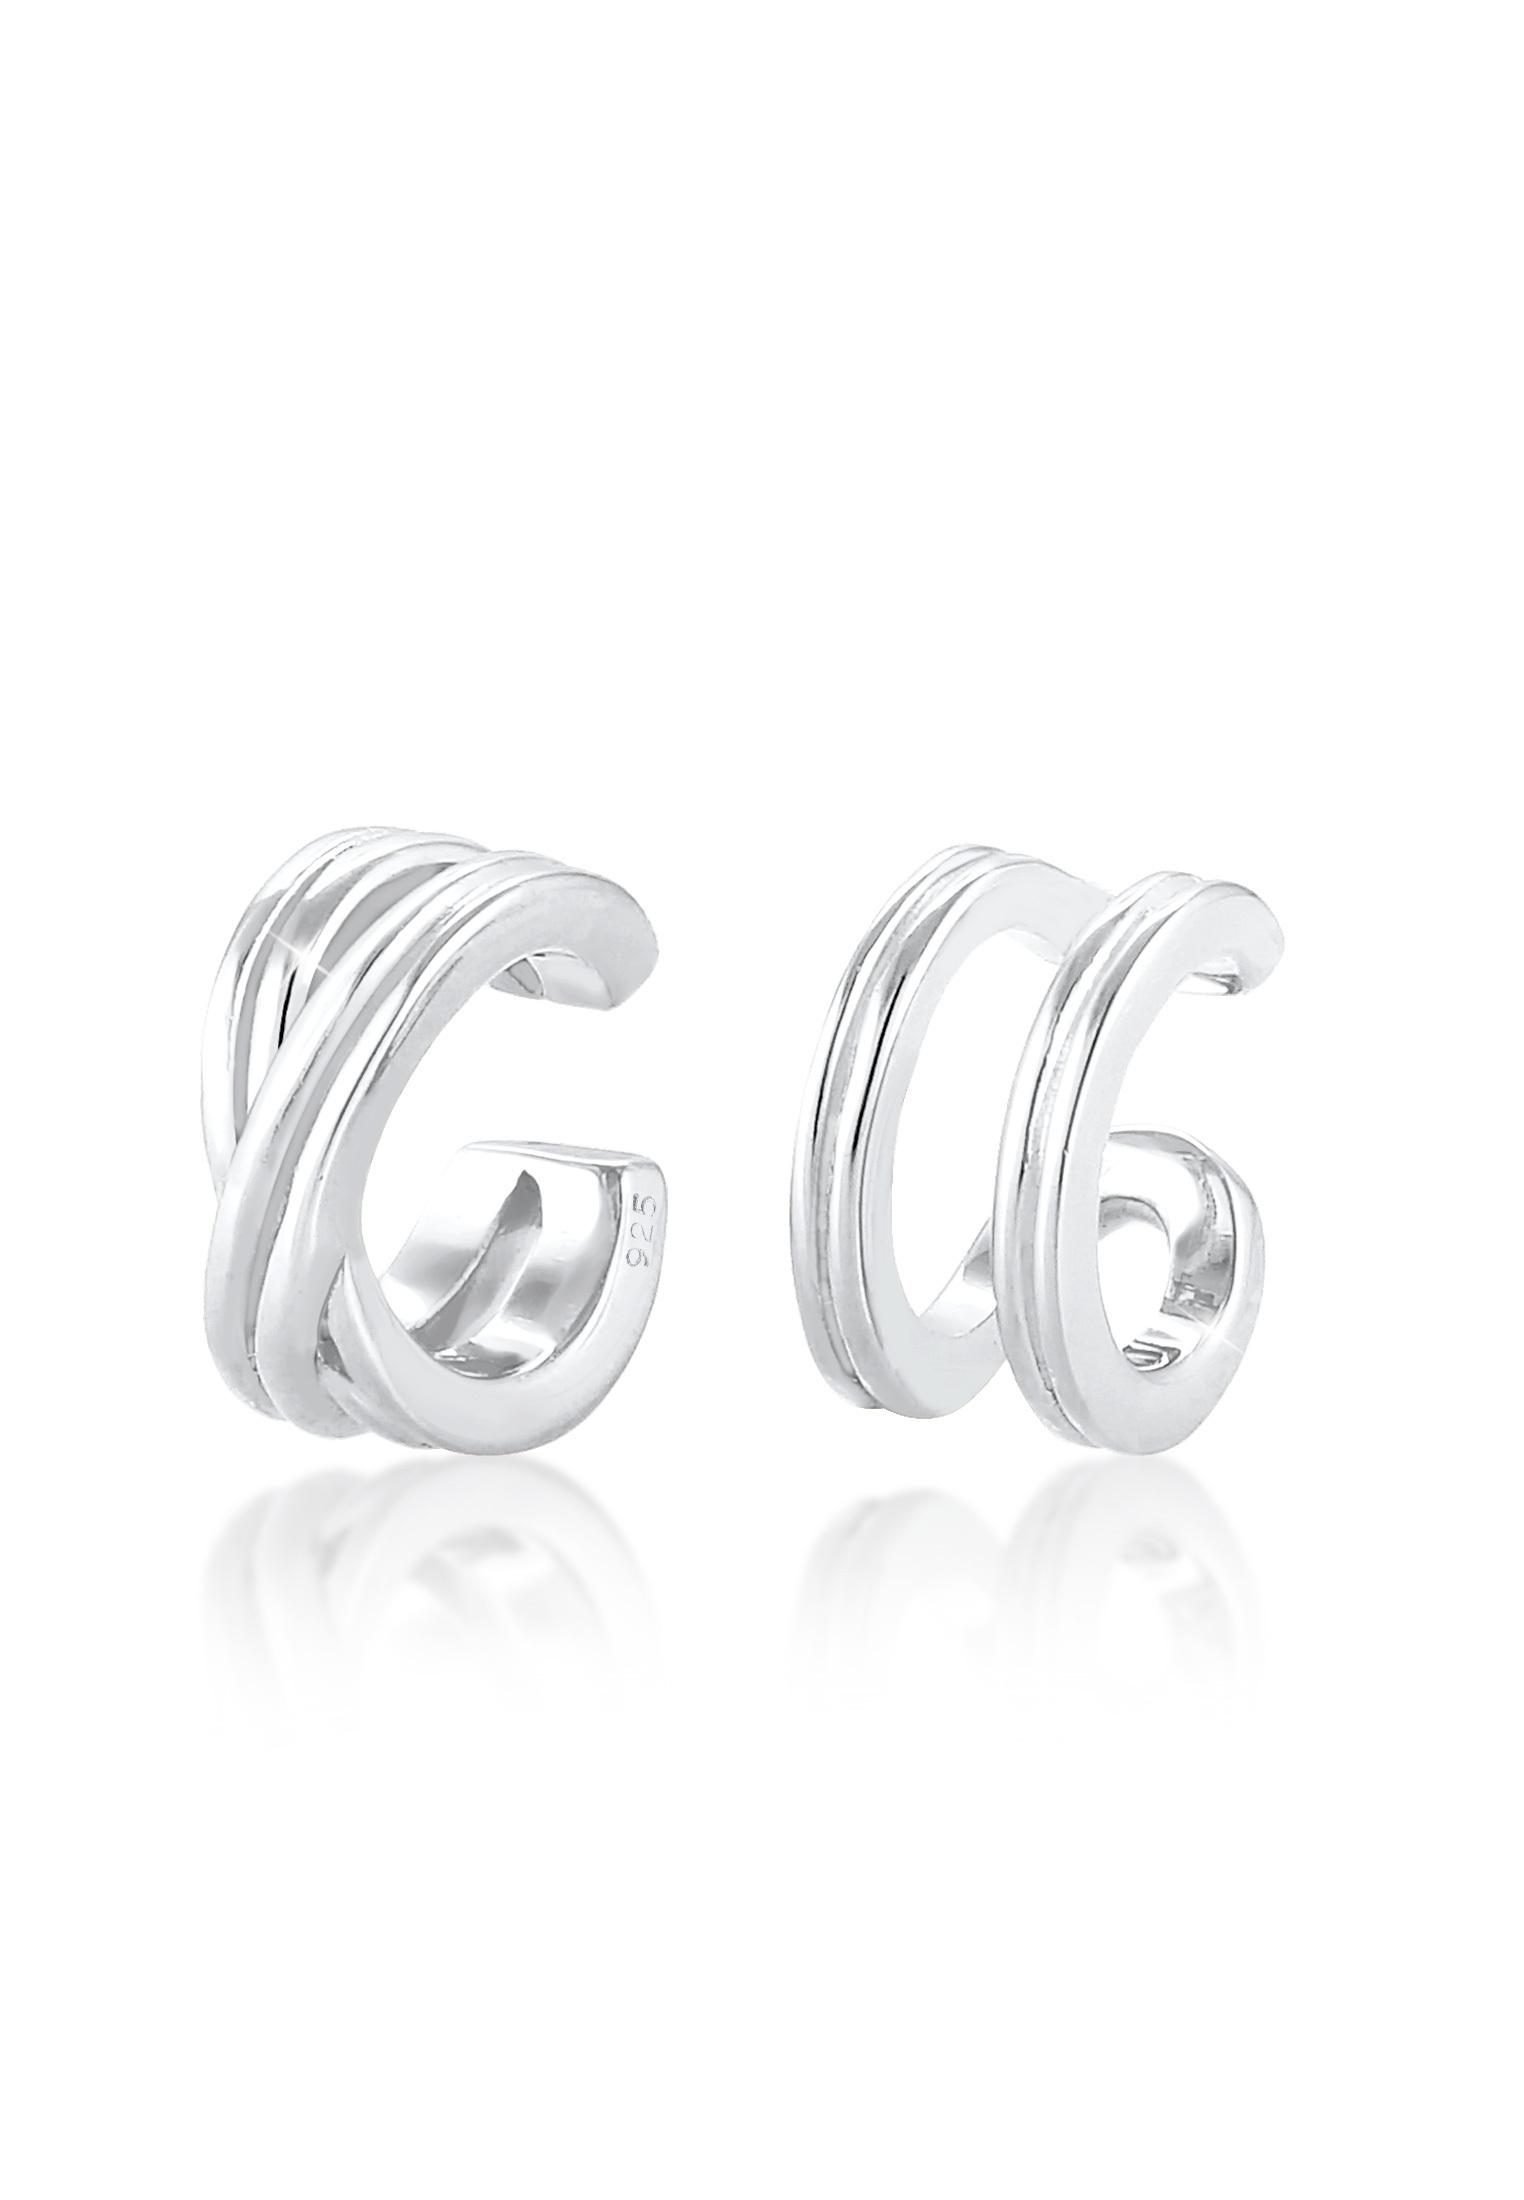 Earcuff | 925er Sterling Silber